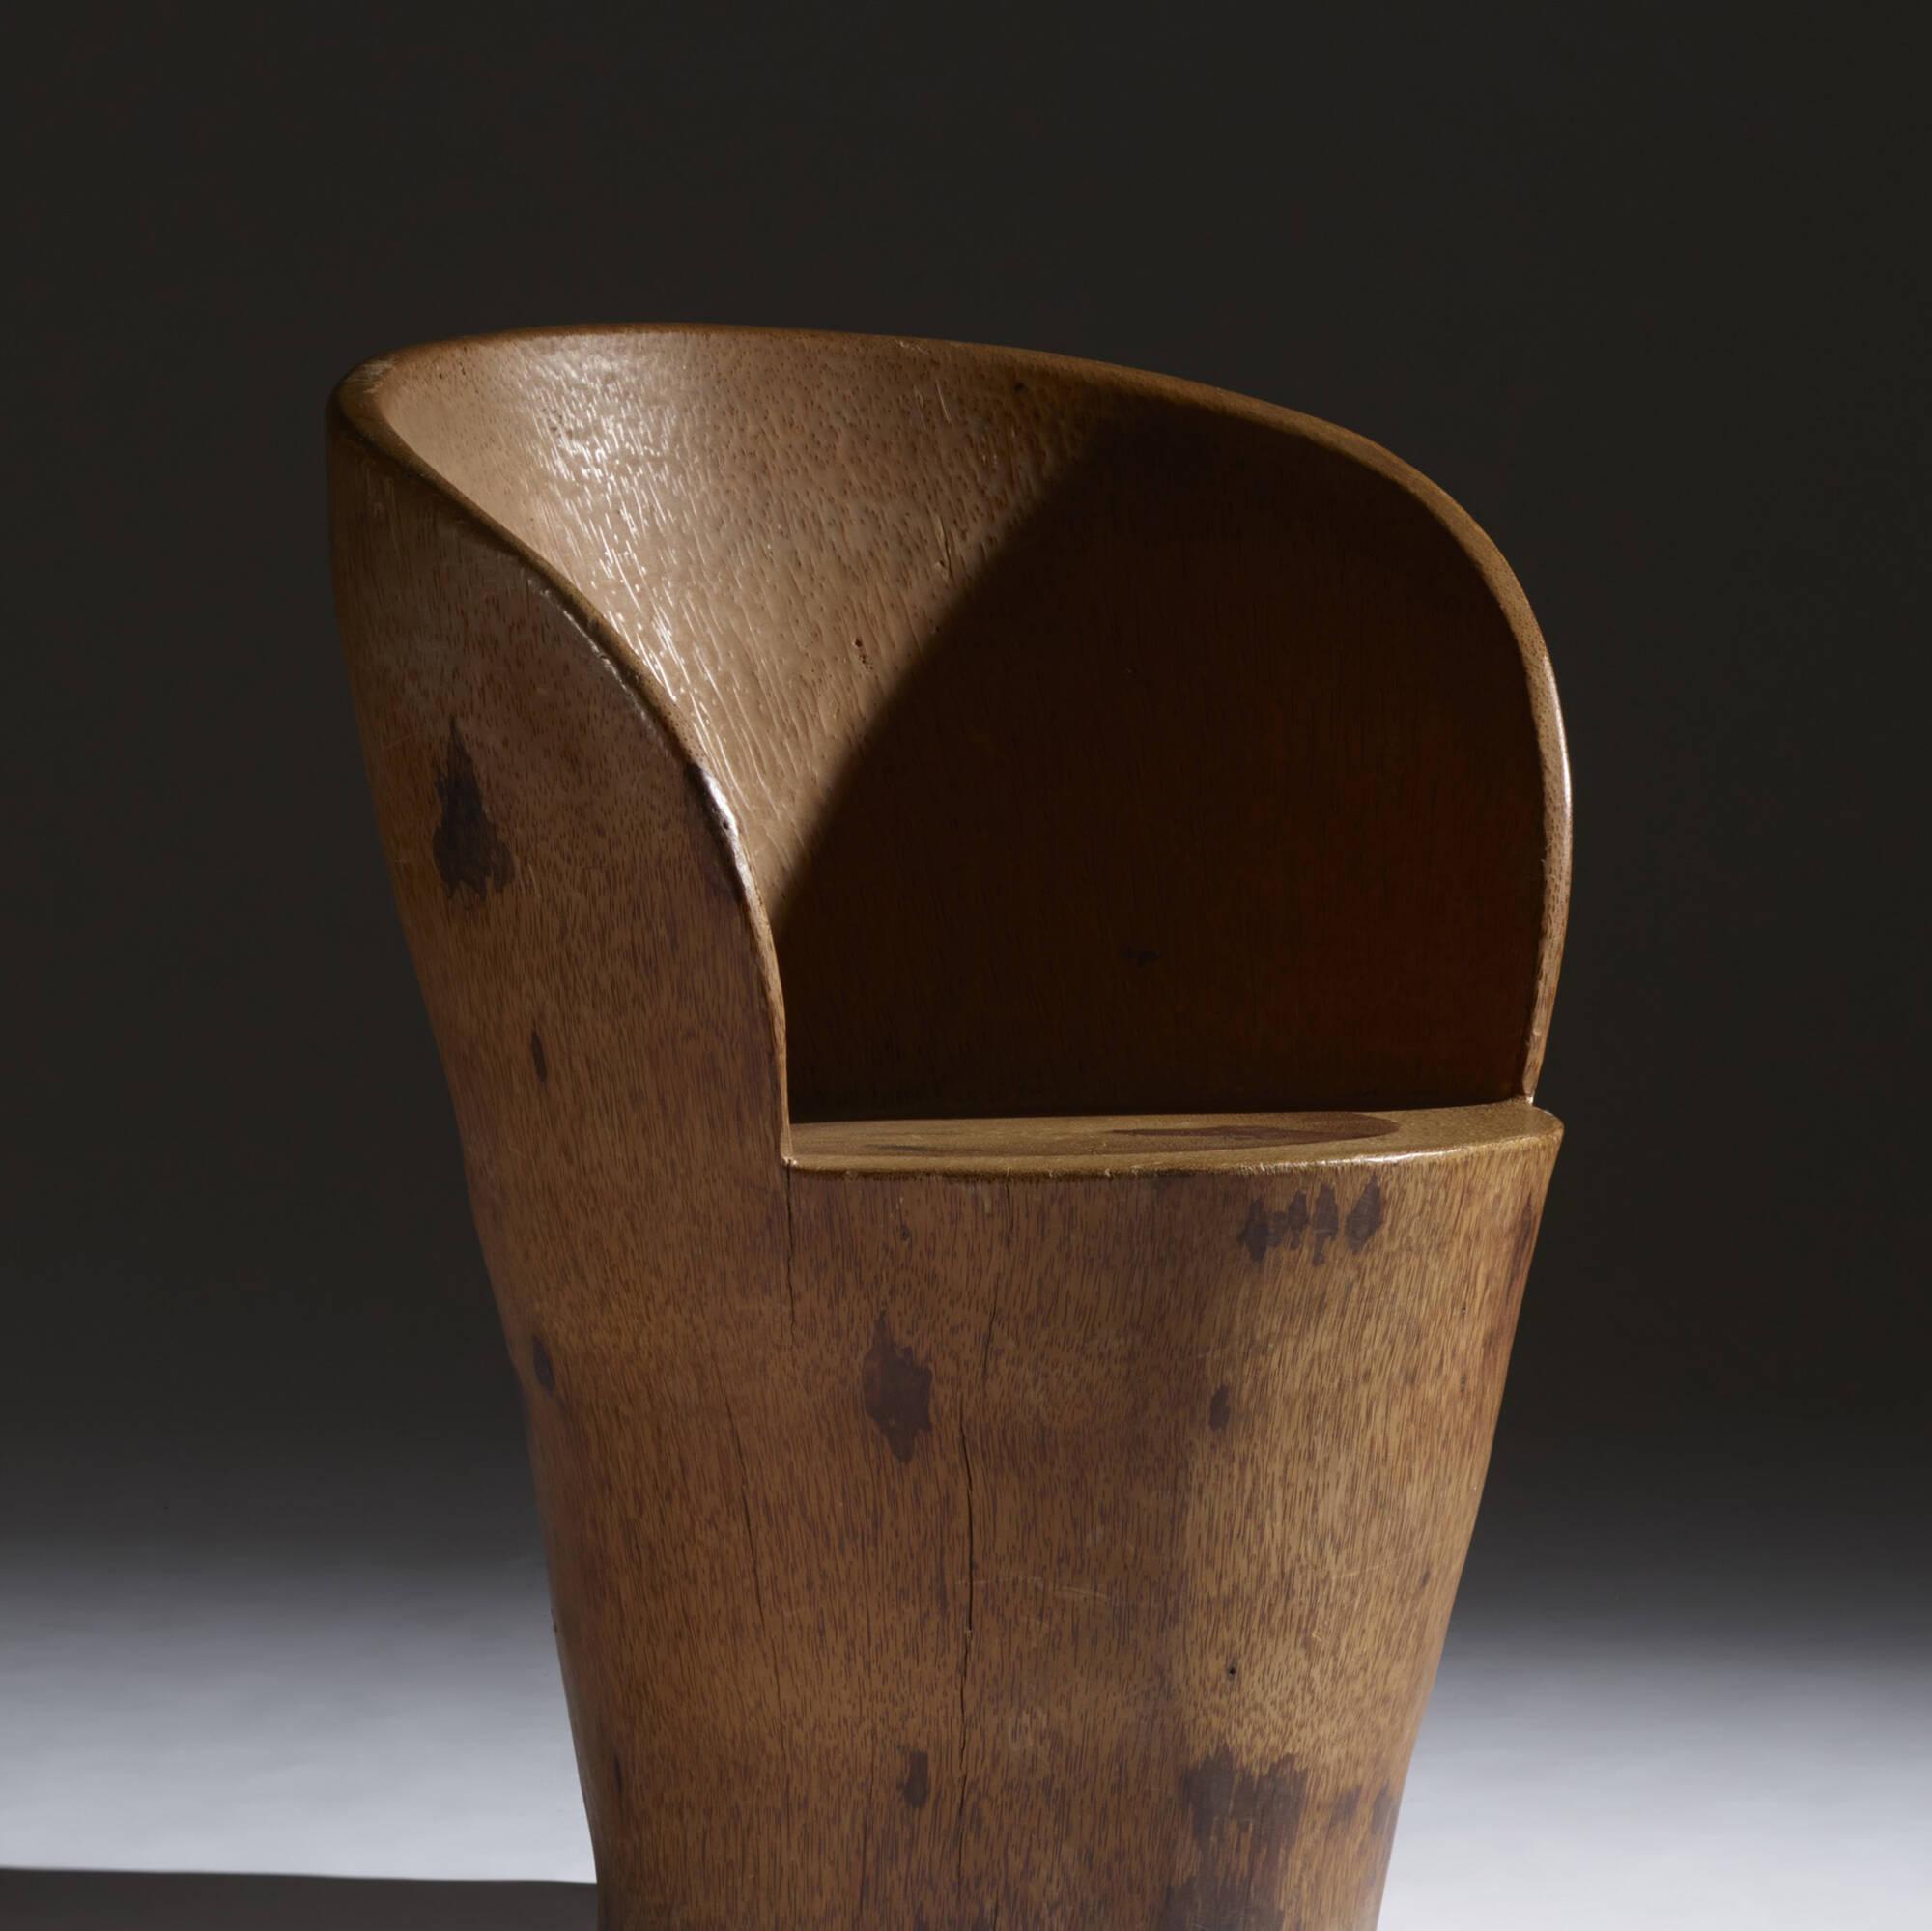 168: José Zanine Caldas / Pilão armchair (3 of 3)